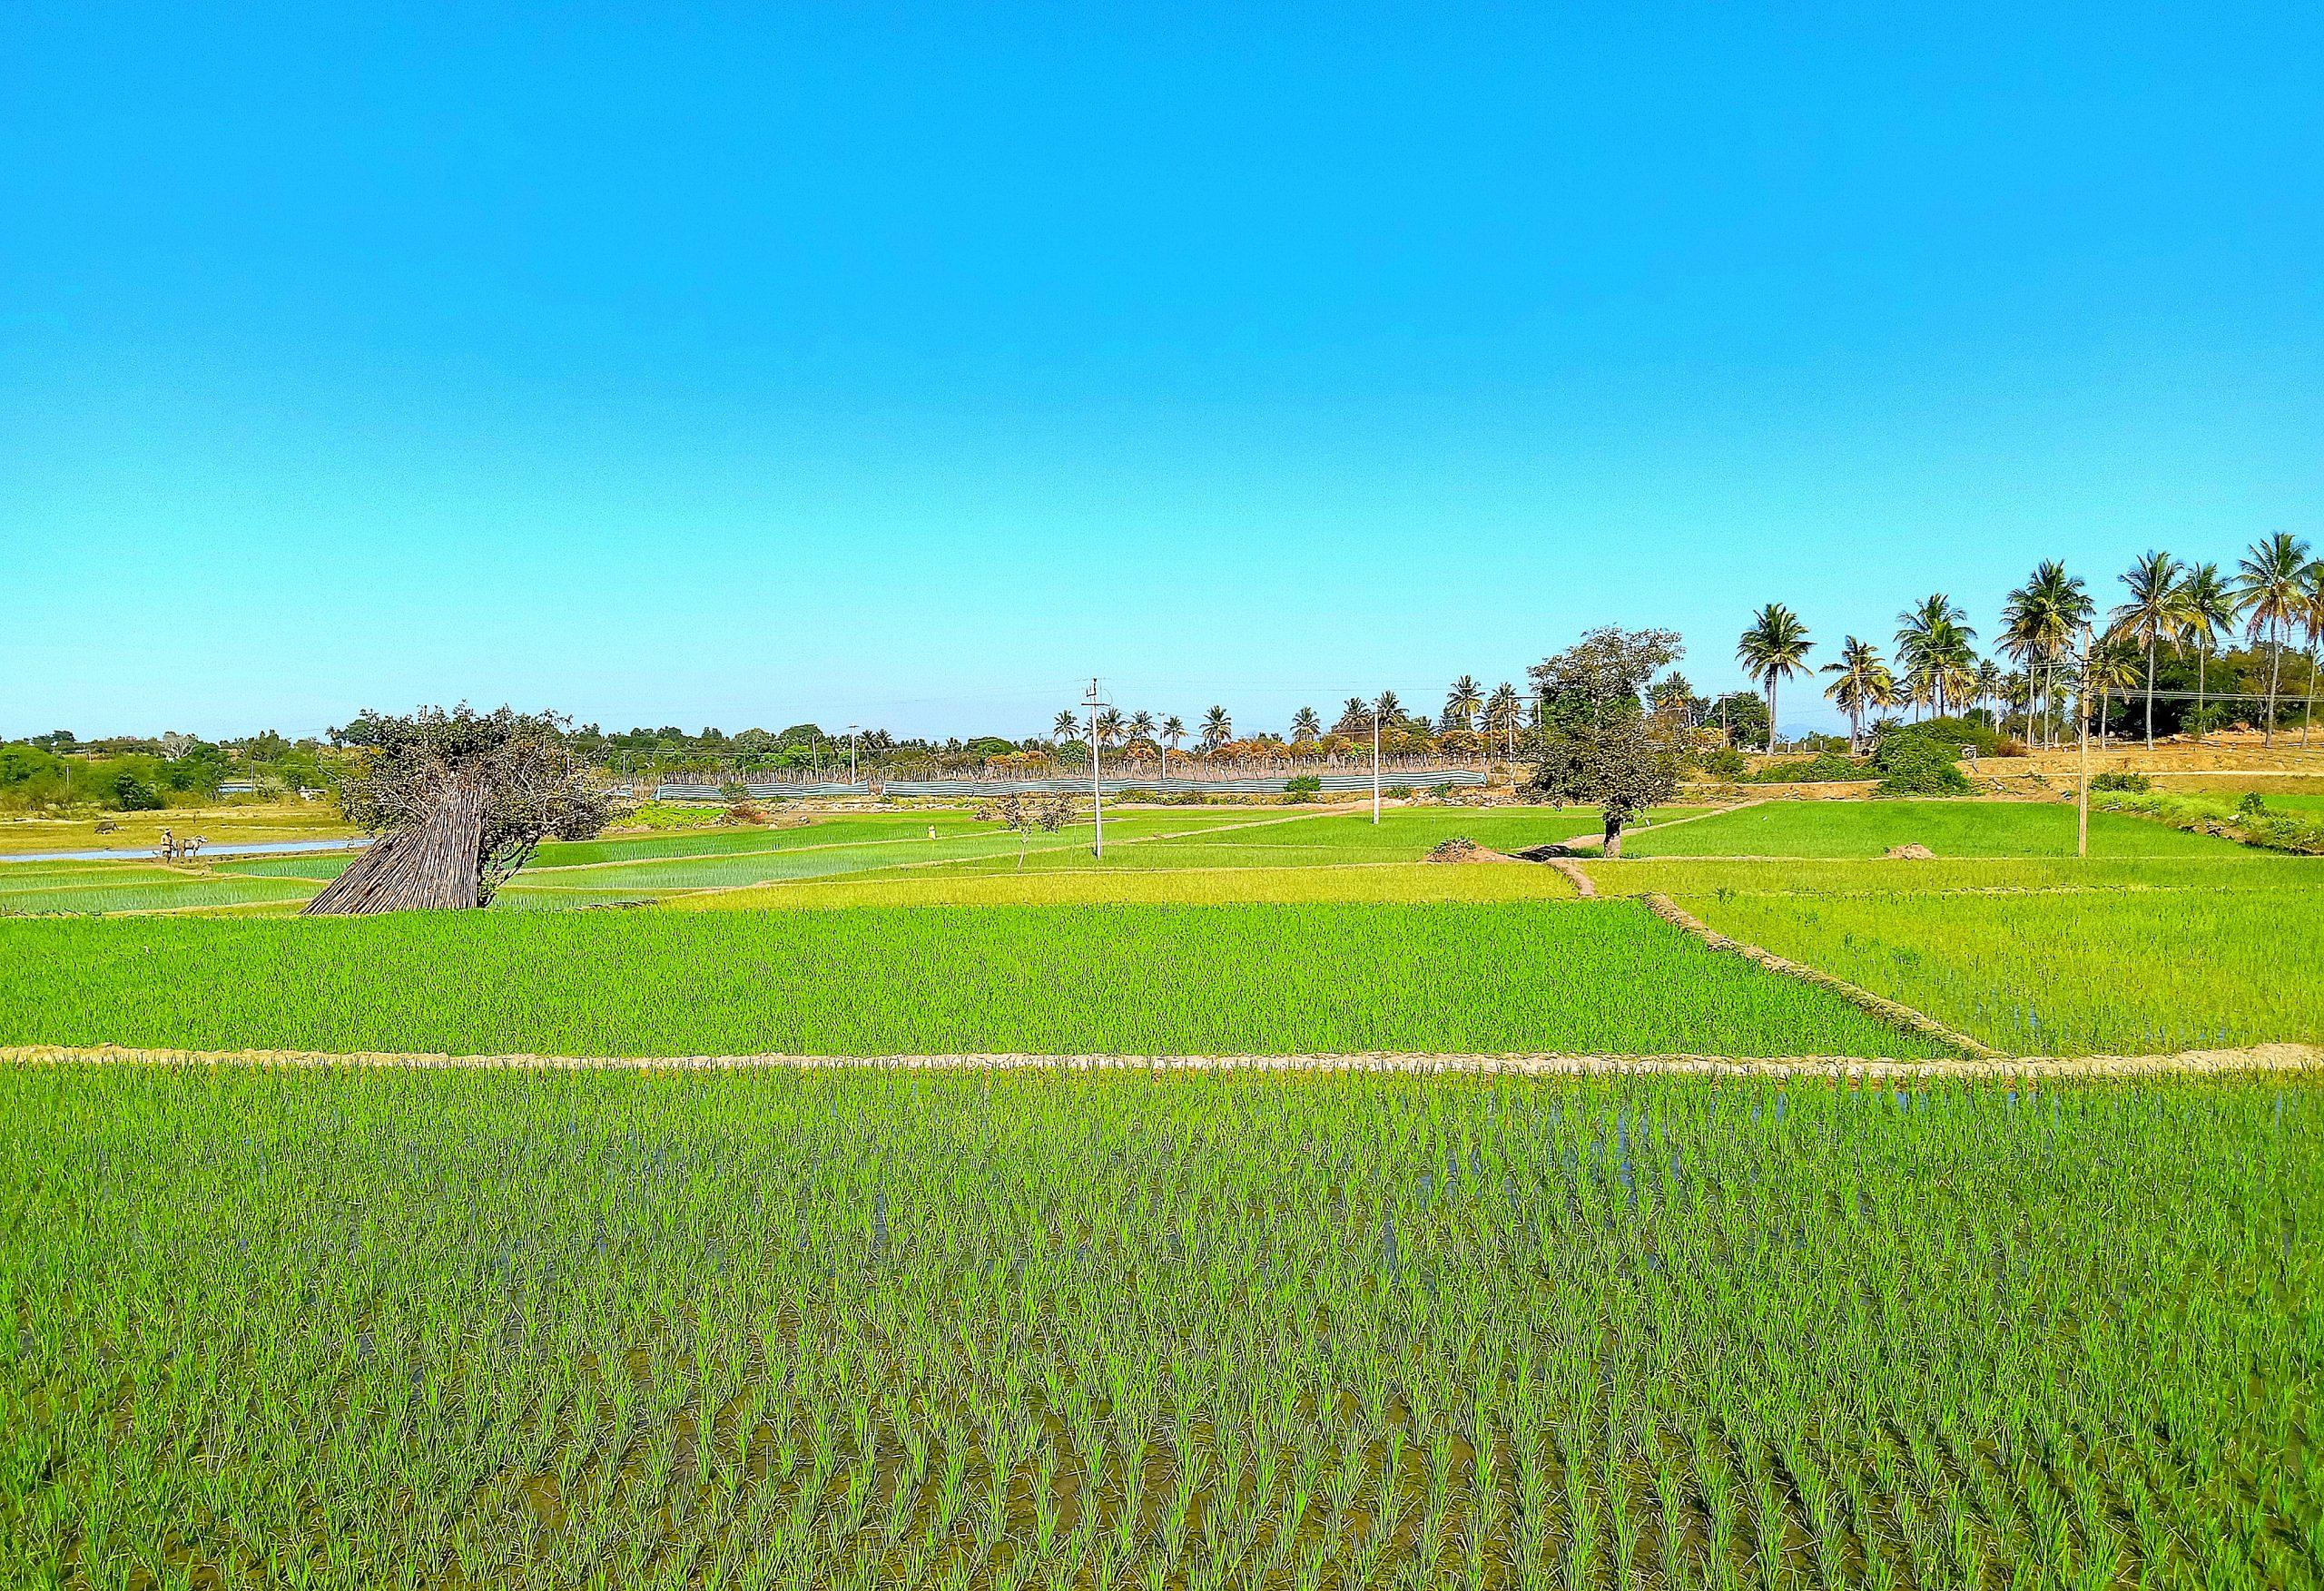 greenery of paddy fields